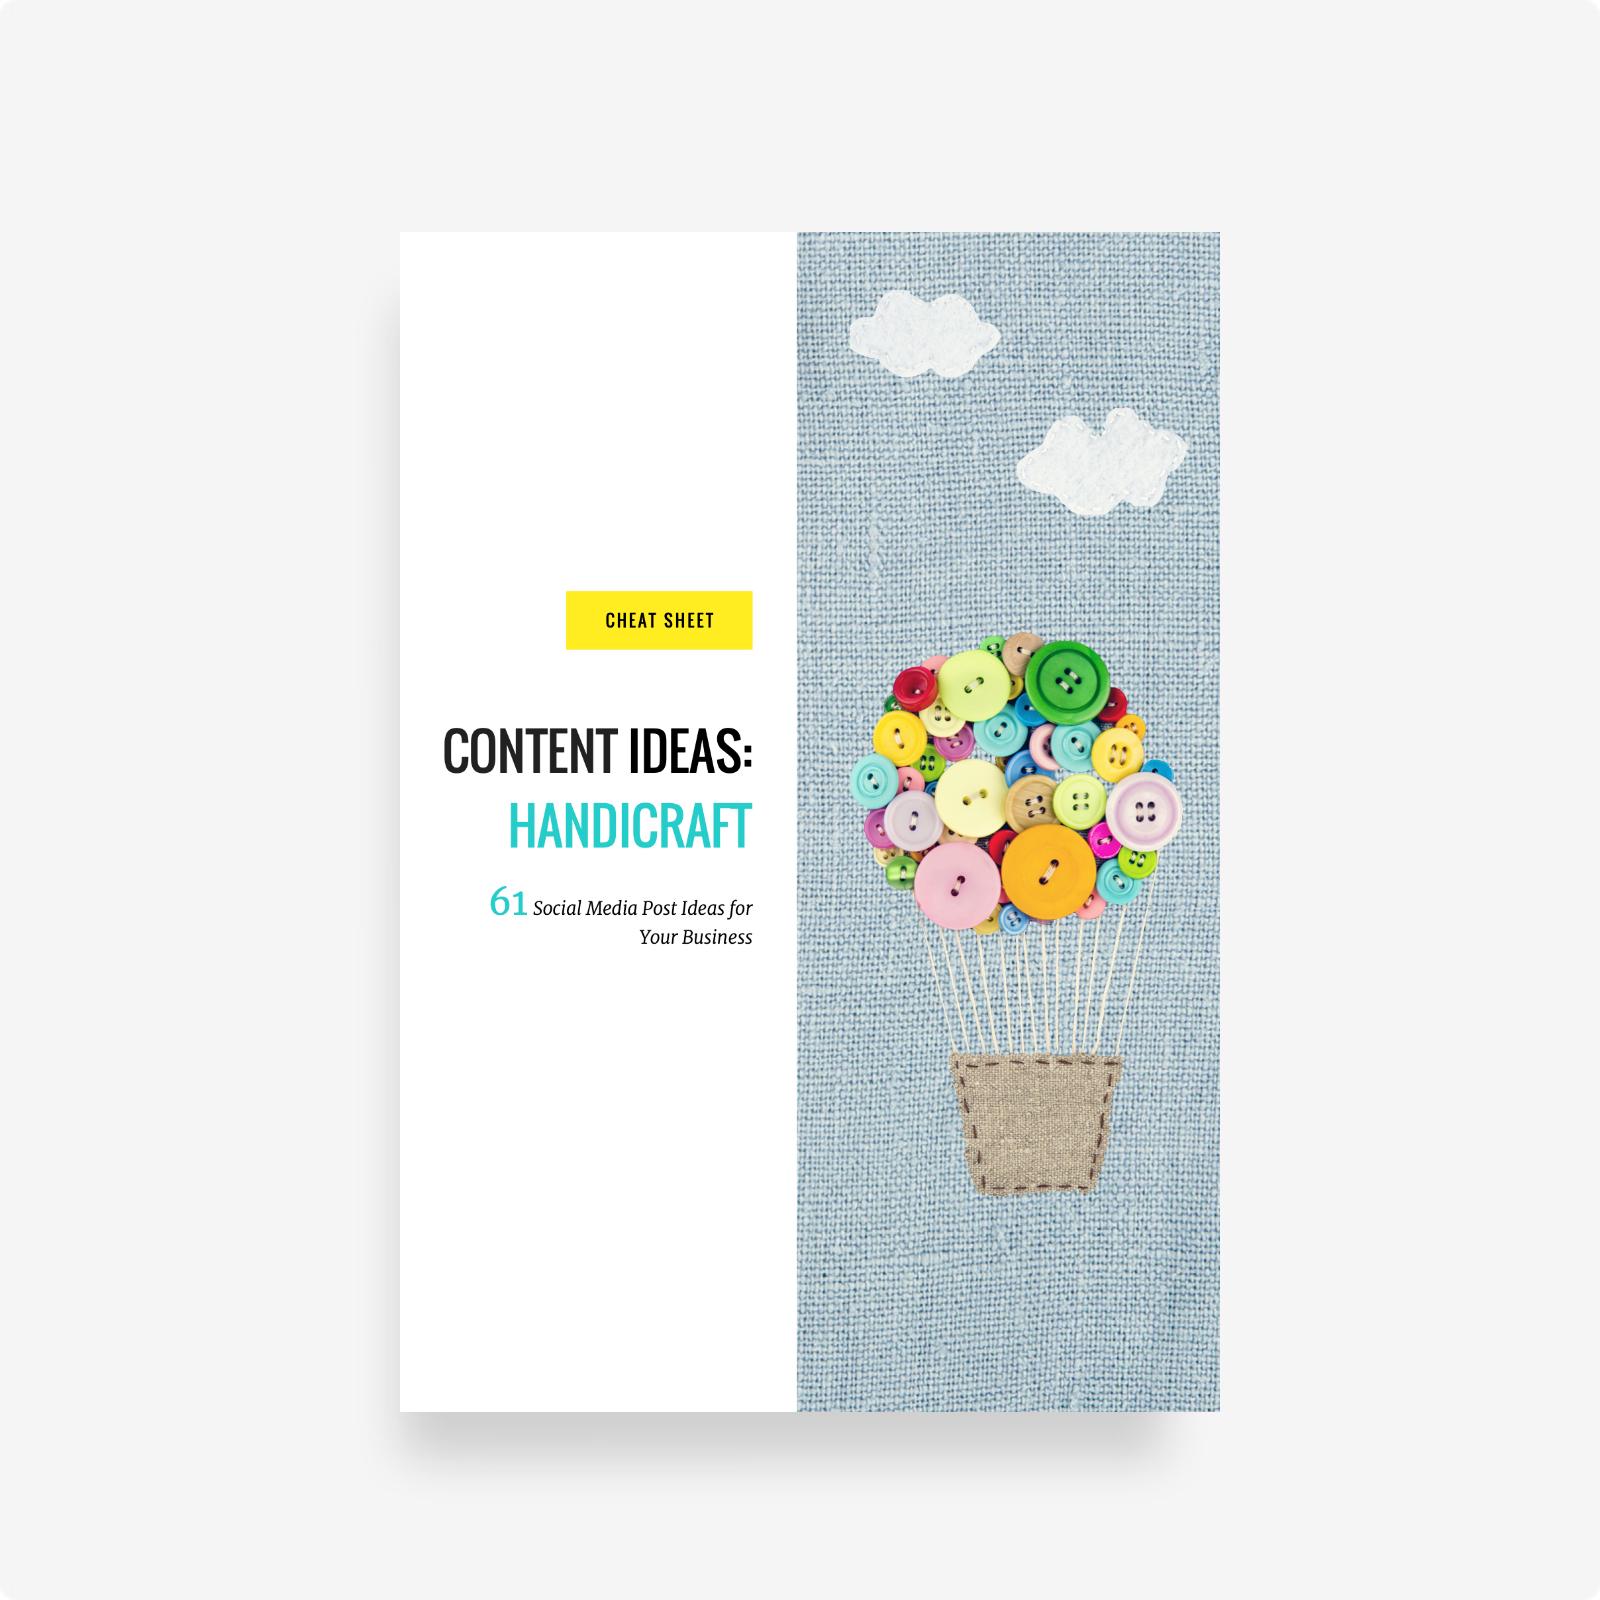 davaii-61-content-ideas-for-handicraft